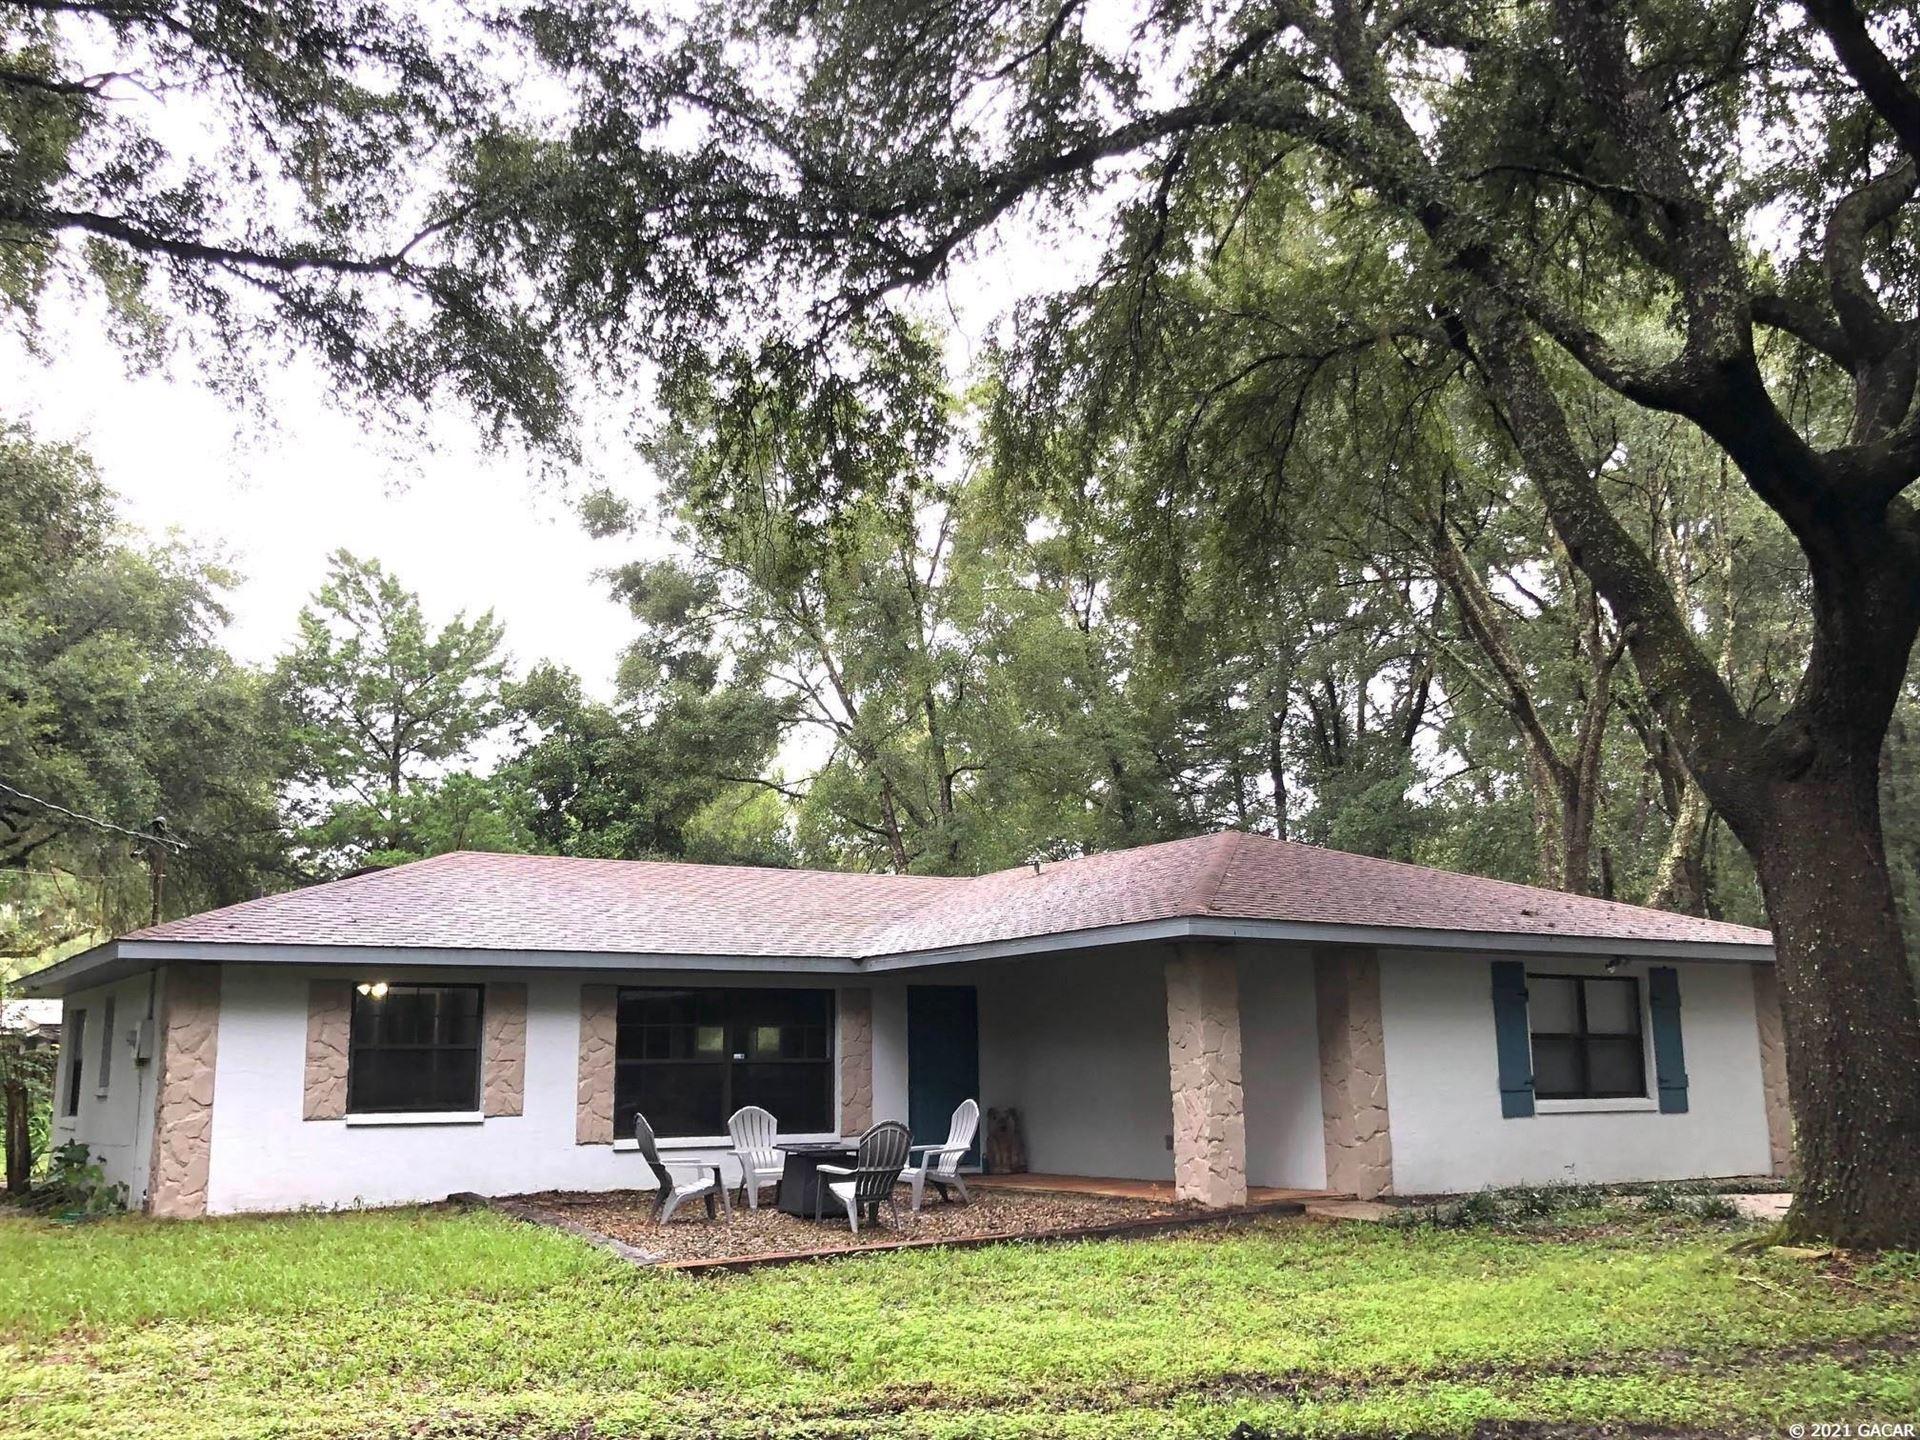 18998 NW 232nd Street, High Springs, FL 32643 - #: 448049